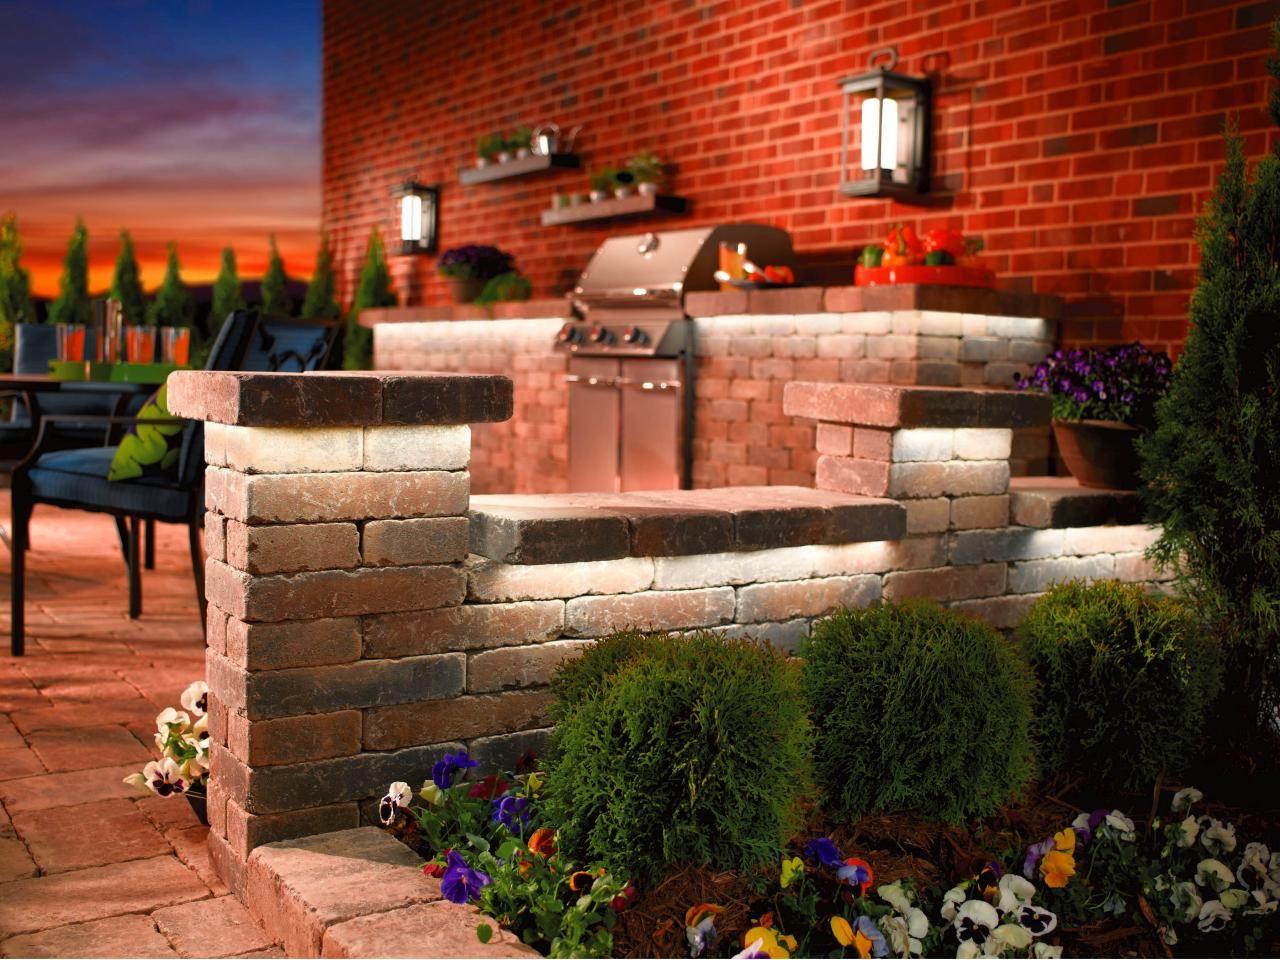 22 Landscape Lighting Ideas Home Garden Pinterest Wiring Outdoor Lights House Diy Electrical How Tos Light Fixtures Ceiling Fans Safety